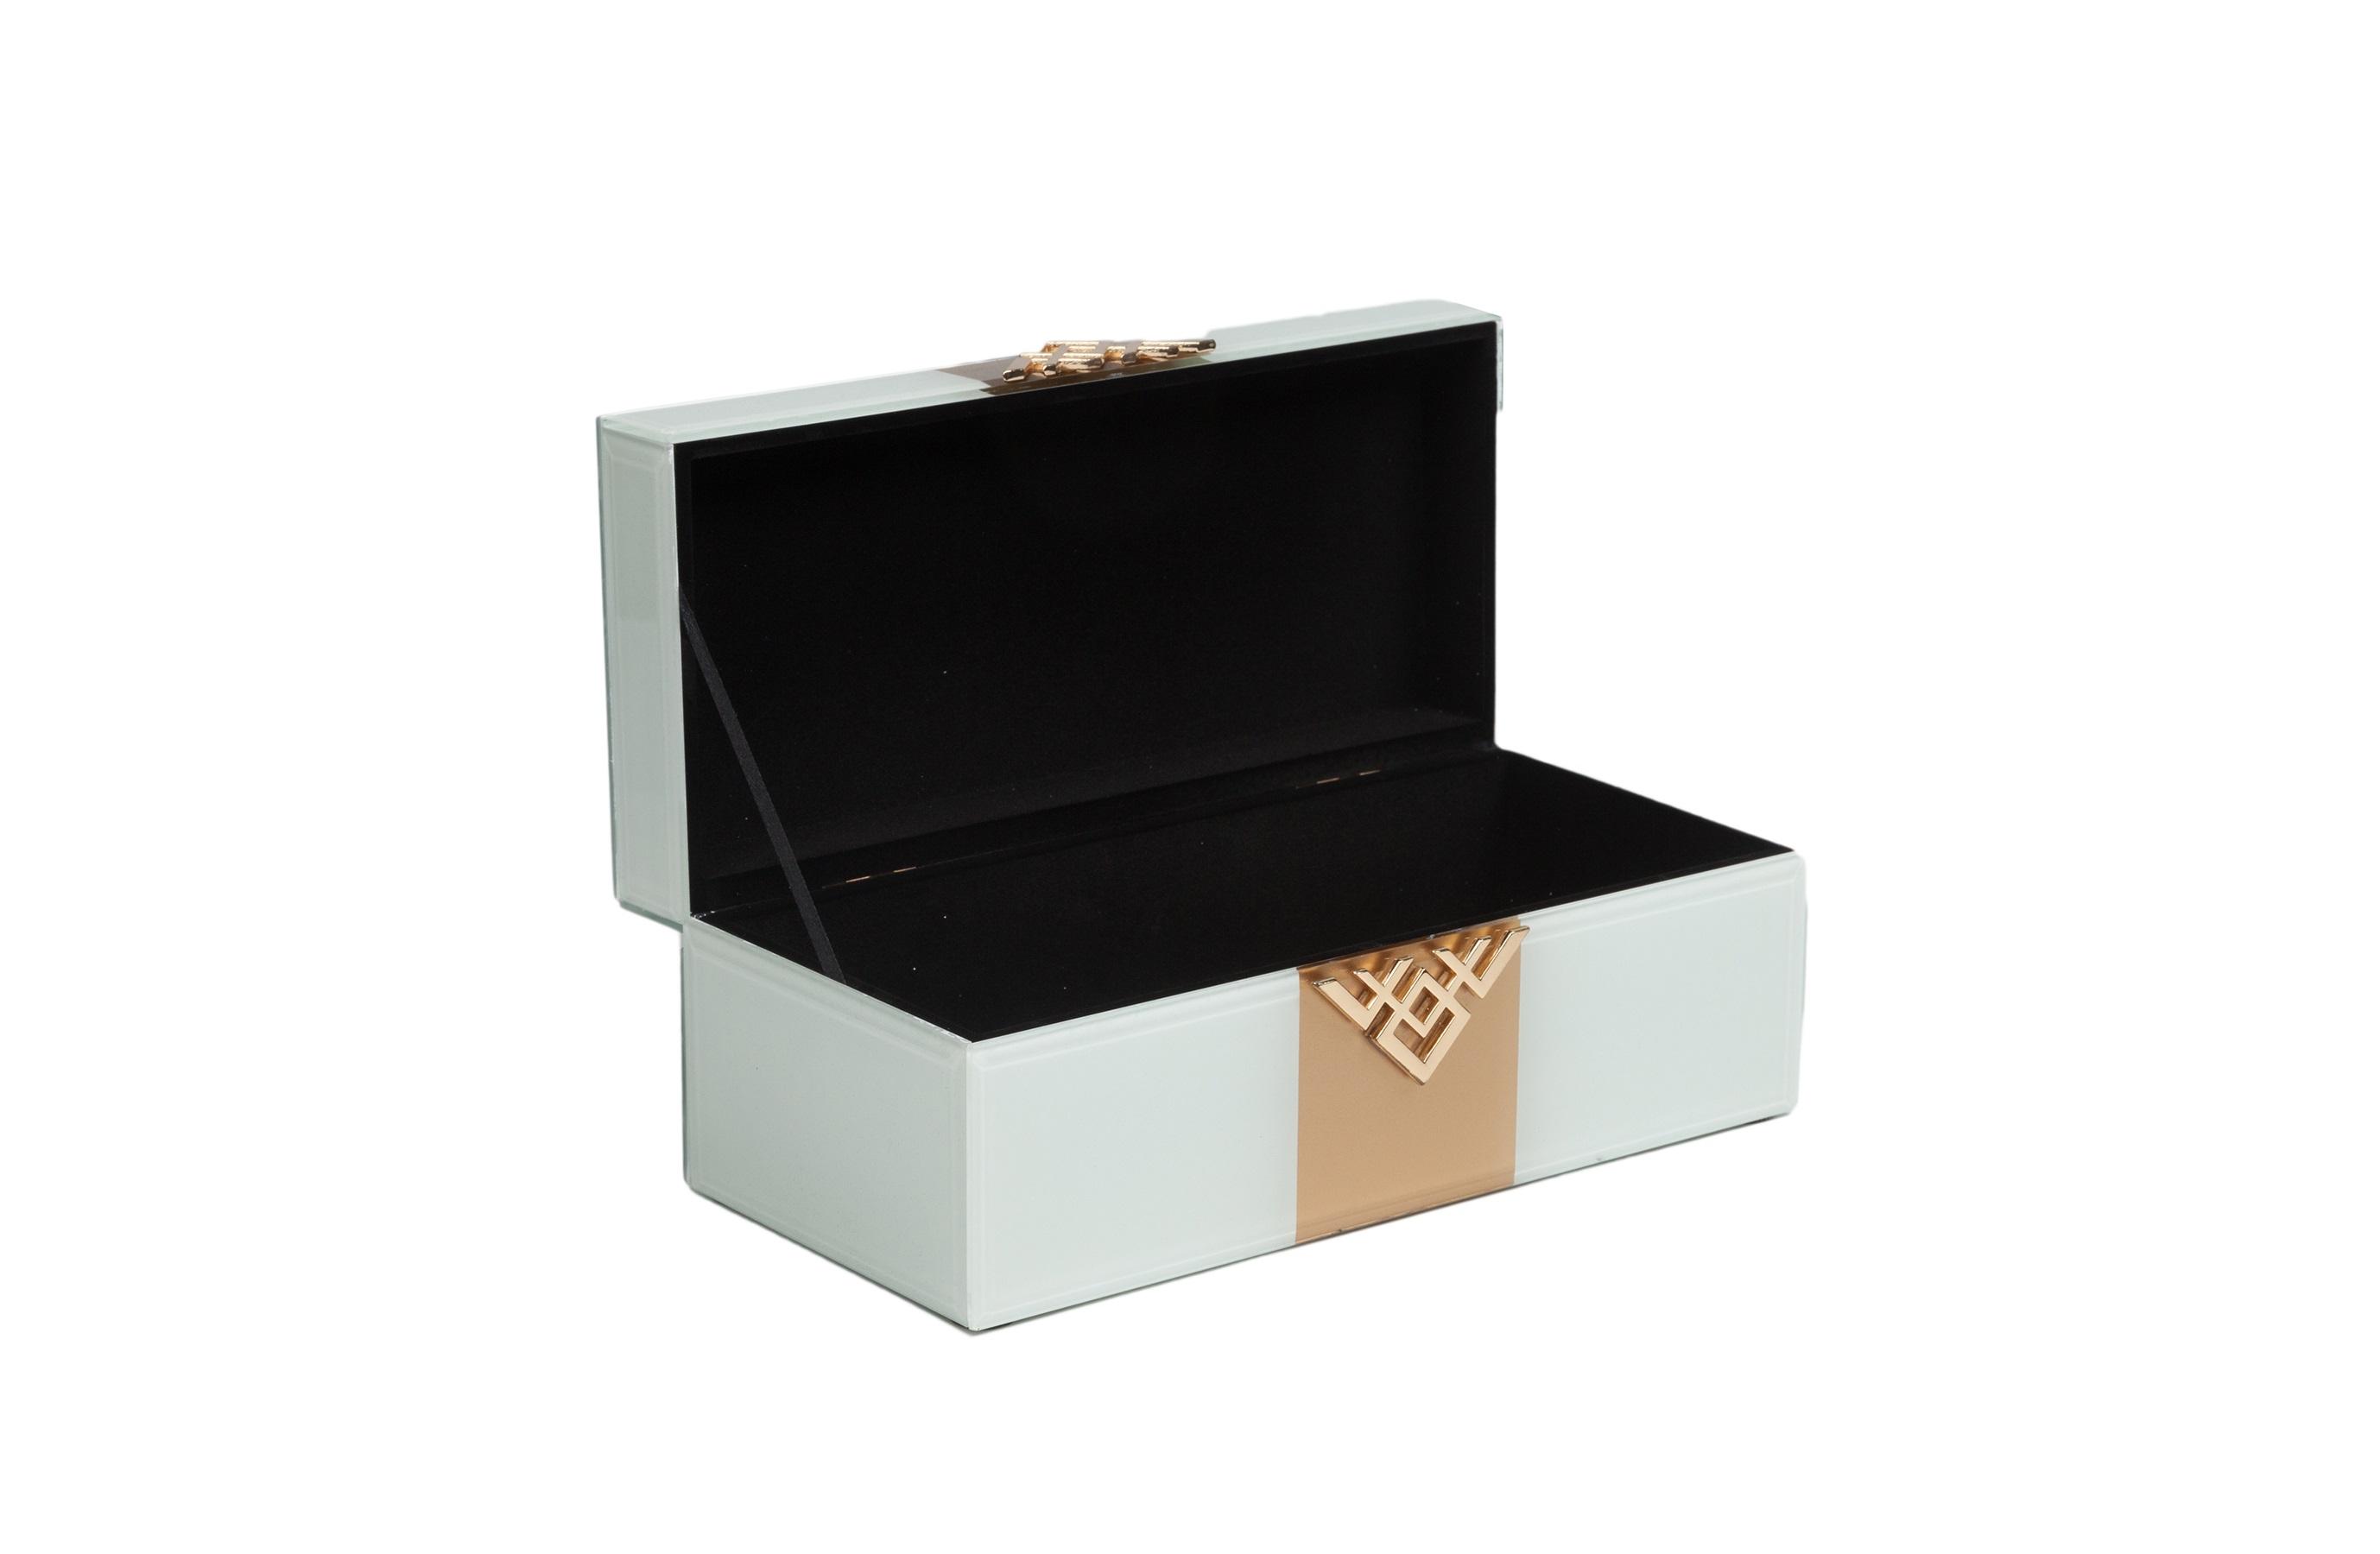 Коробка для ювелирных украшений AkoniКоробки<br>Материал: МДФ, Стекло<br><br>Material: МДФ<br>Length см: None<br>Width см: 13<br>Depth см: 27<br>Height см: 10